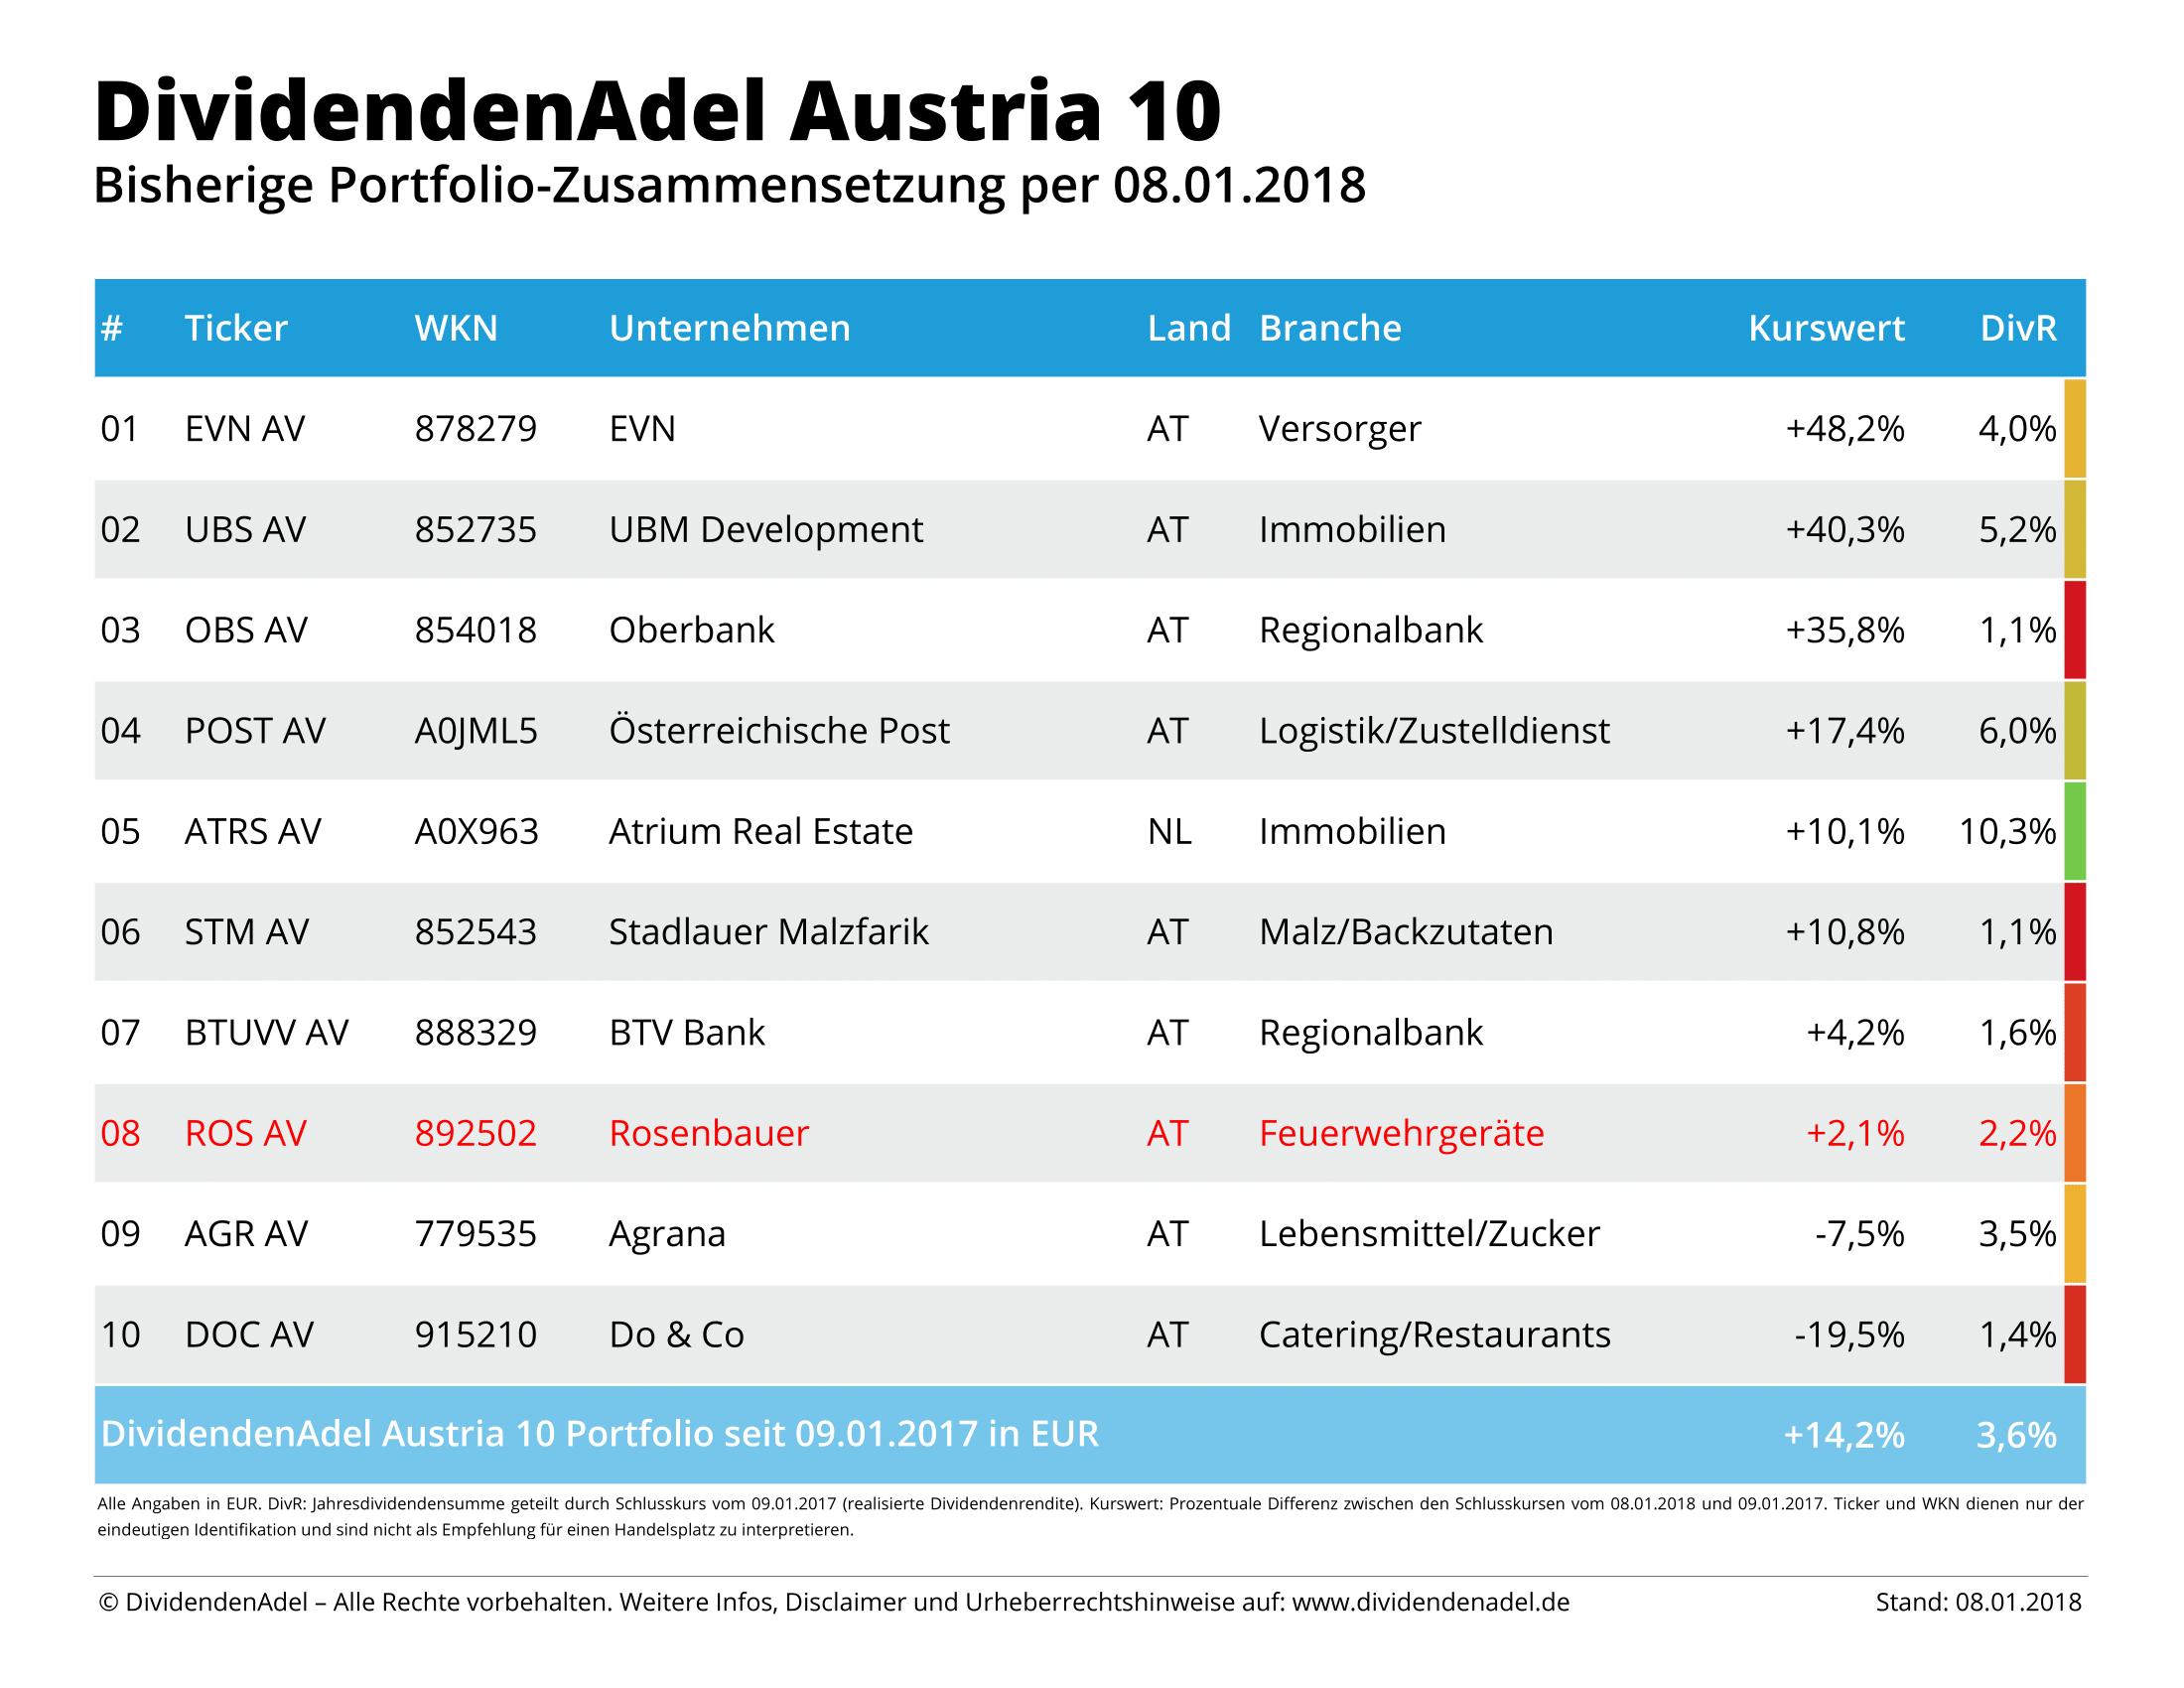 2018-01-08 OP DividendenAdel Austria 10-1